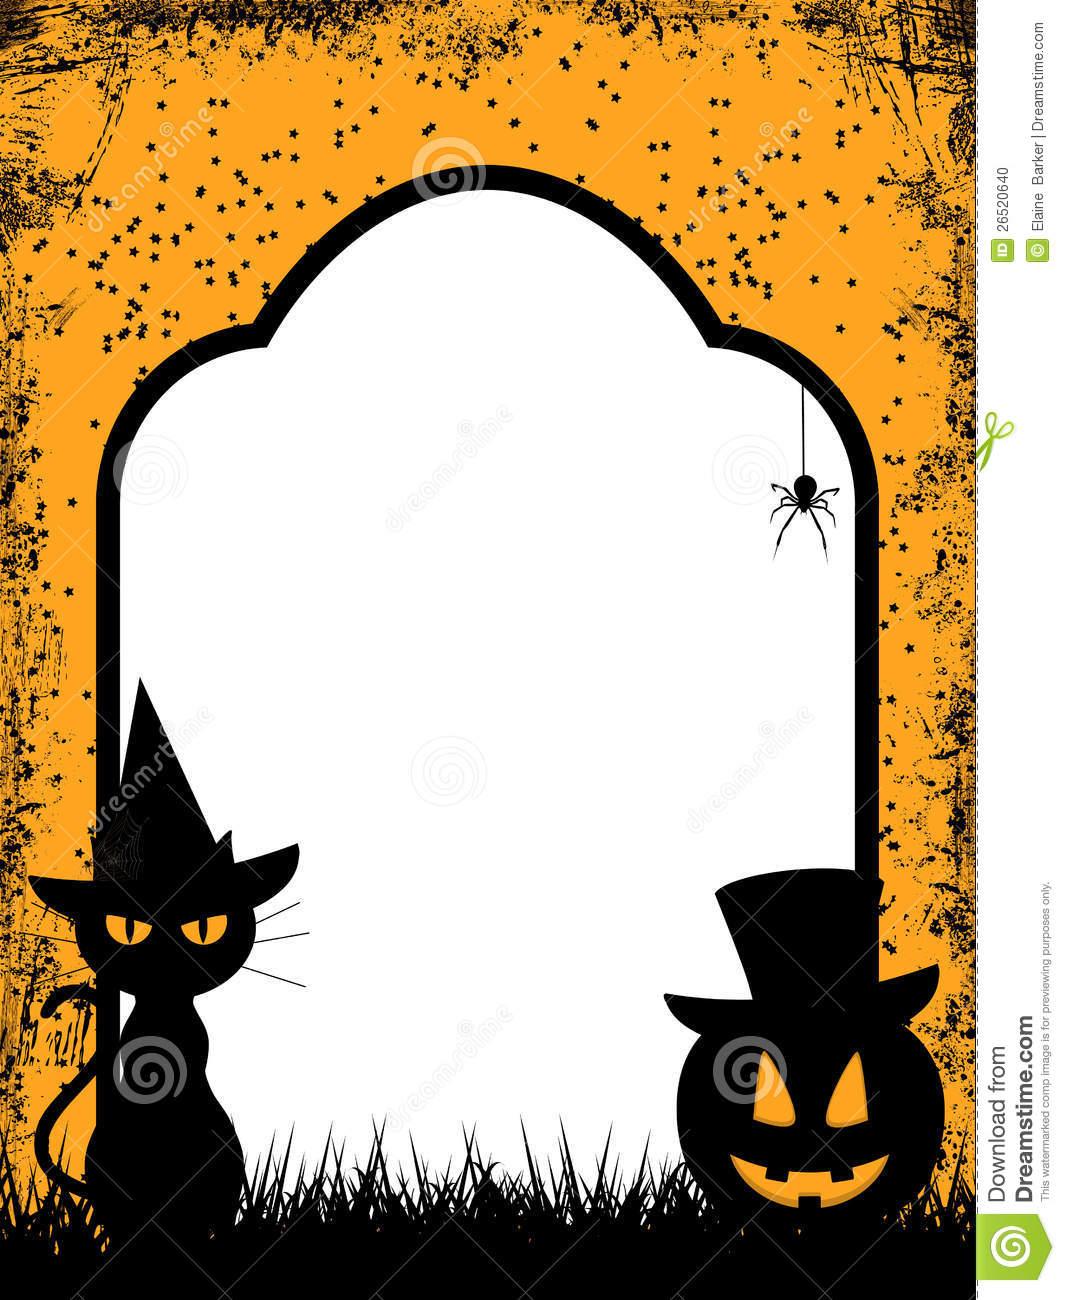 hight resolution of border clipart halloween border clipart halloween border clipart